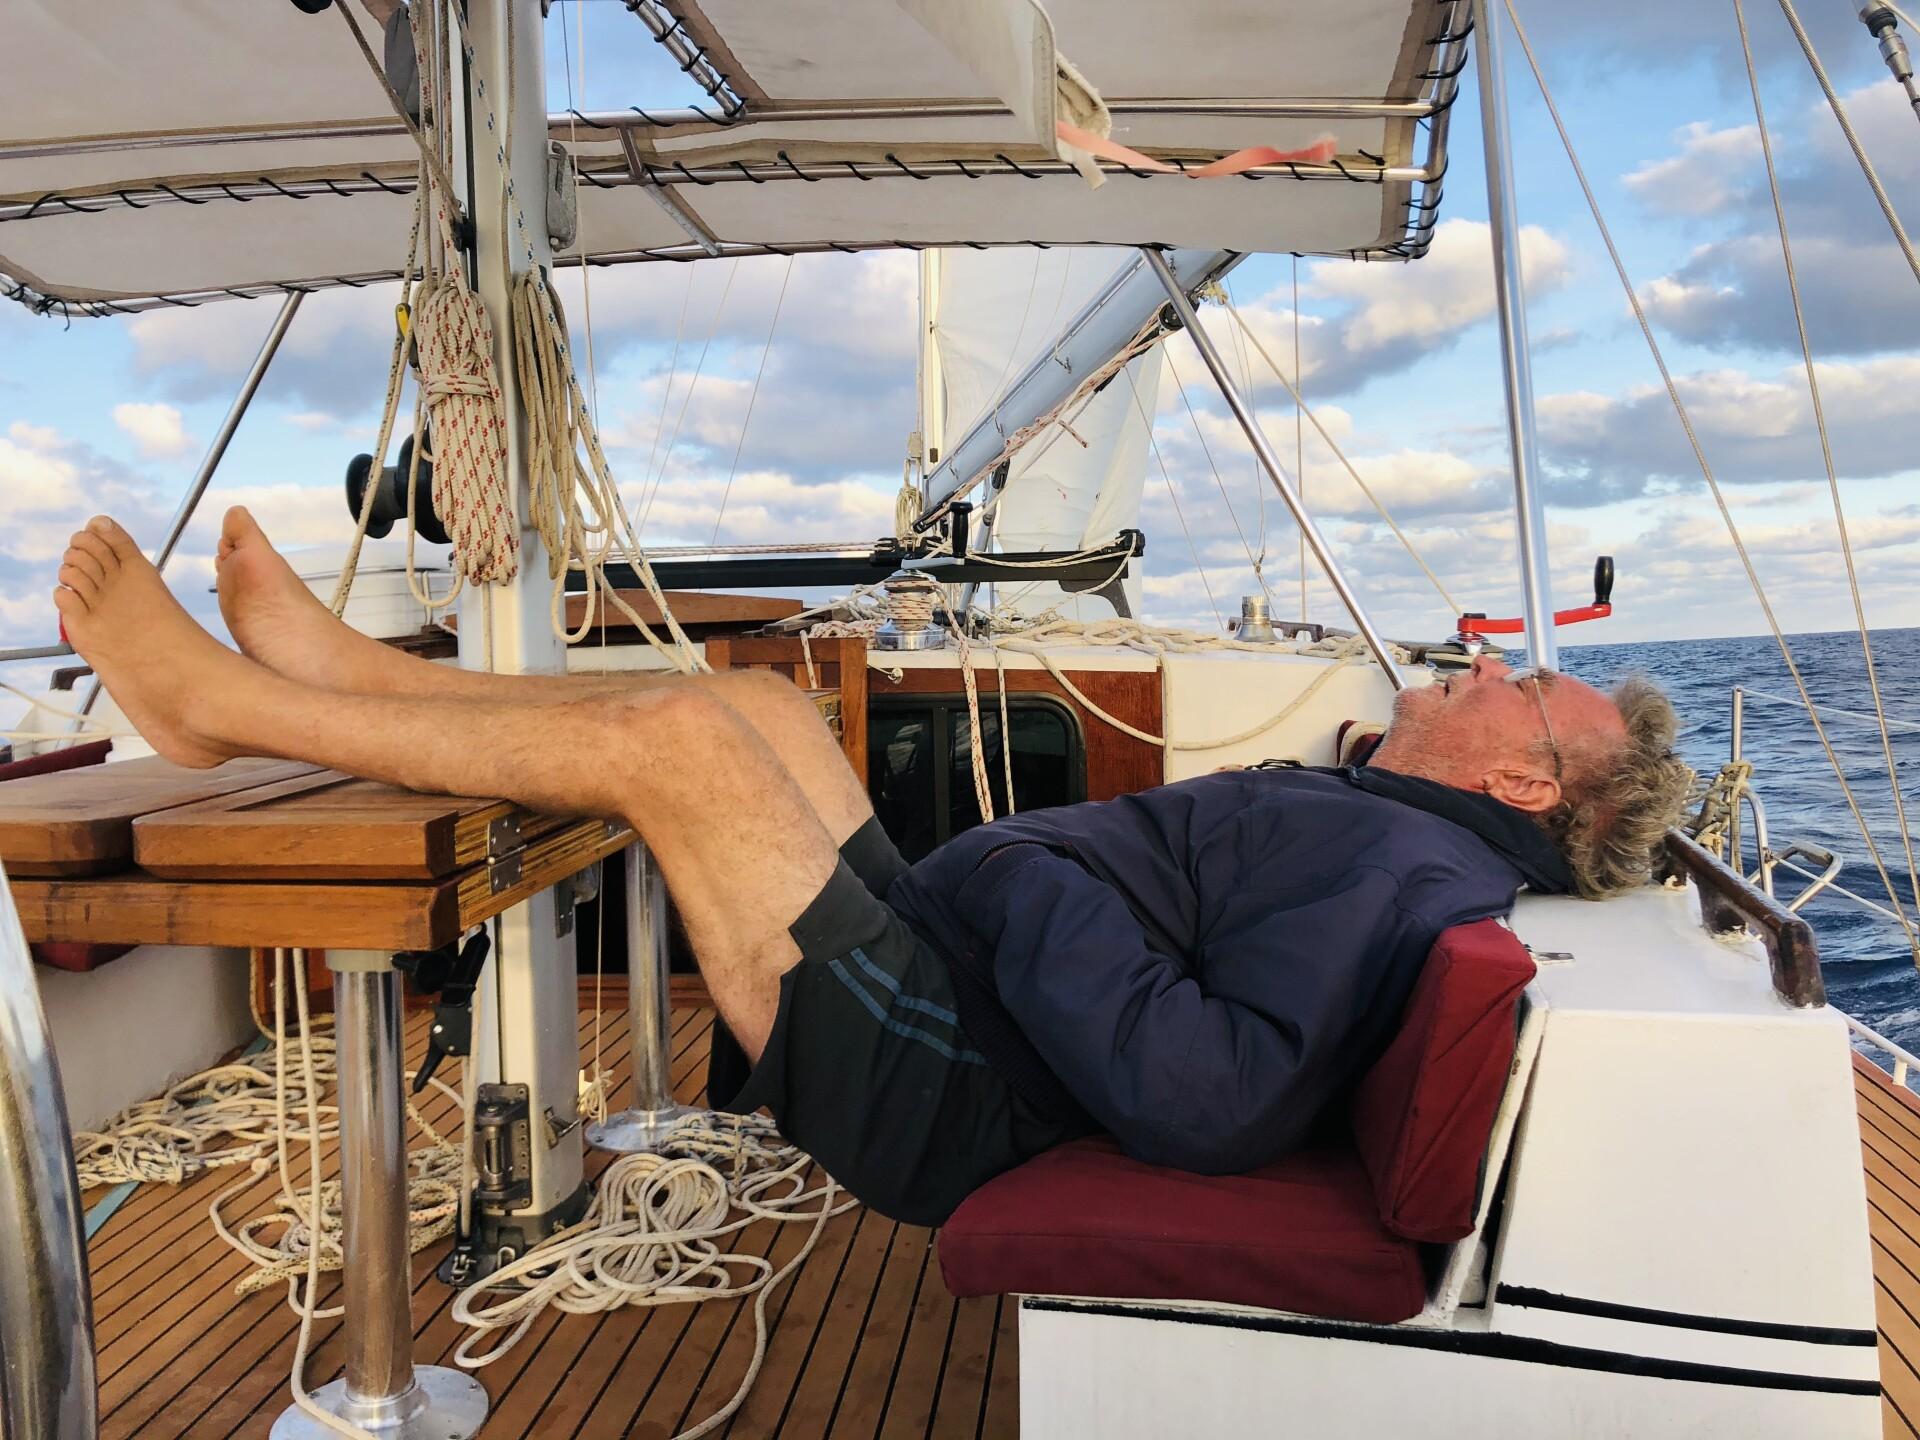 Sven Karrlson sleeps on sailboat